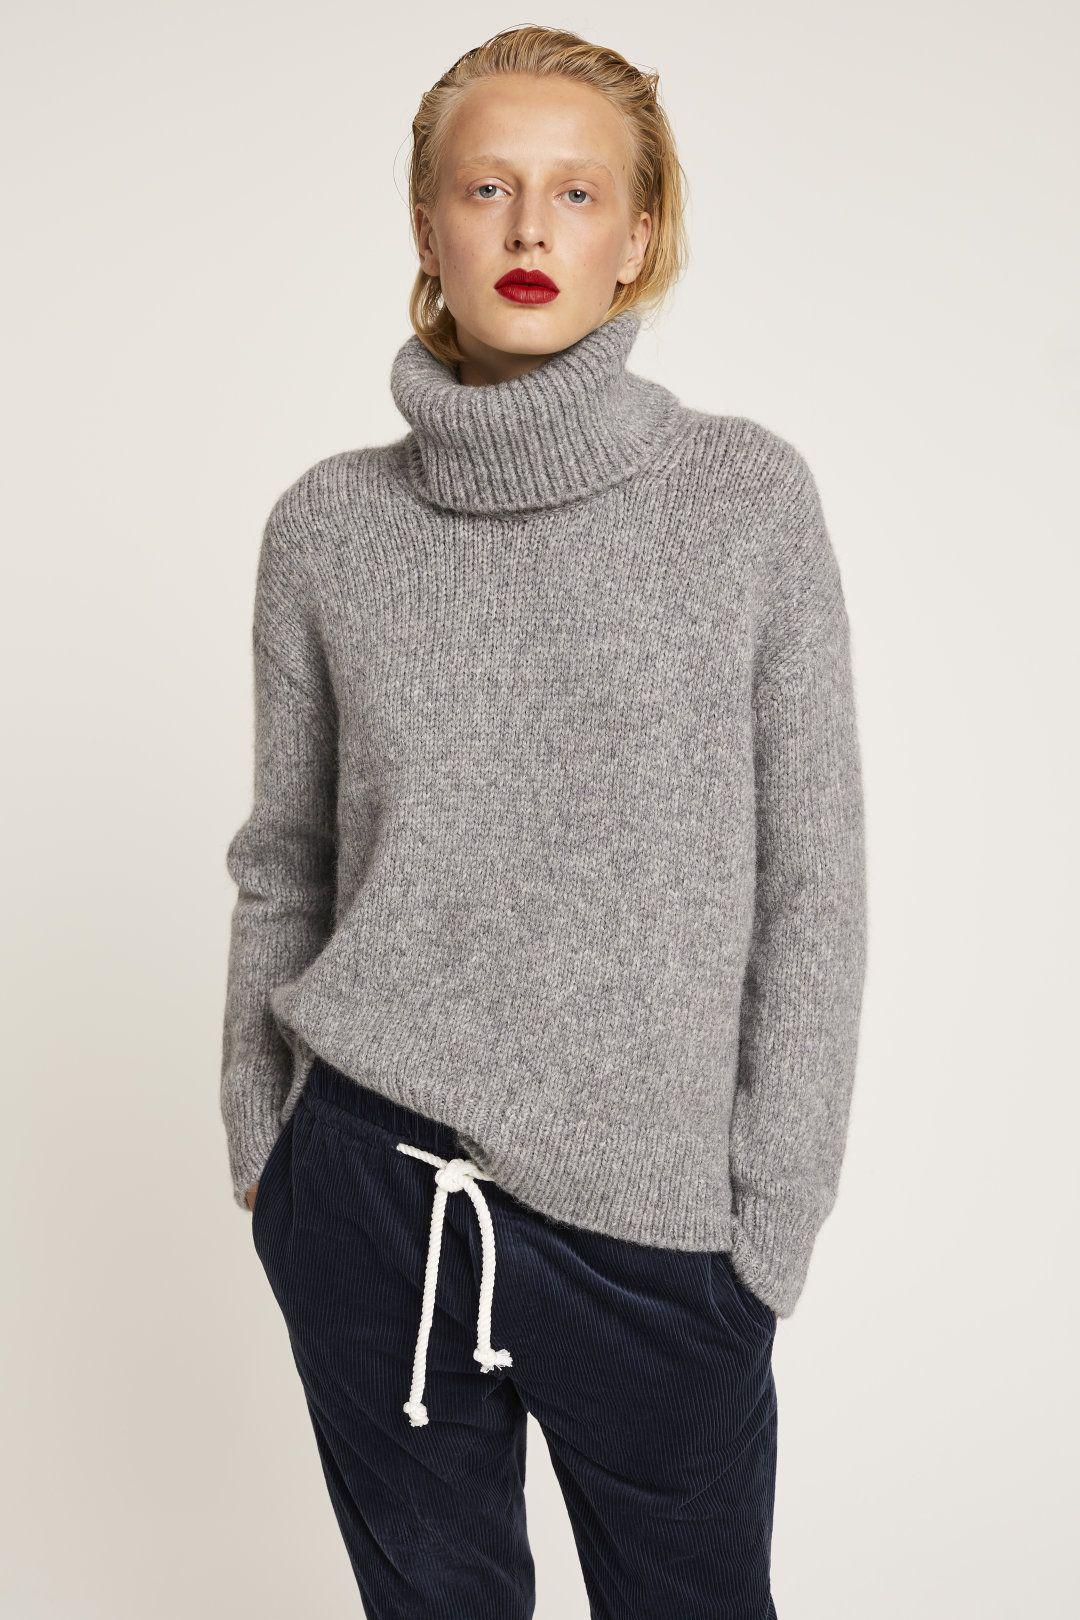 51514a3a5bfa Royal Baby Alpaca Mix Turtleneck Sweater